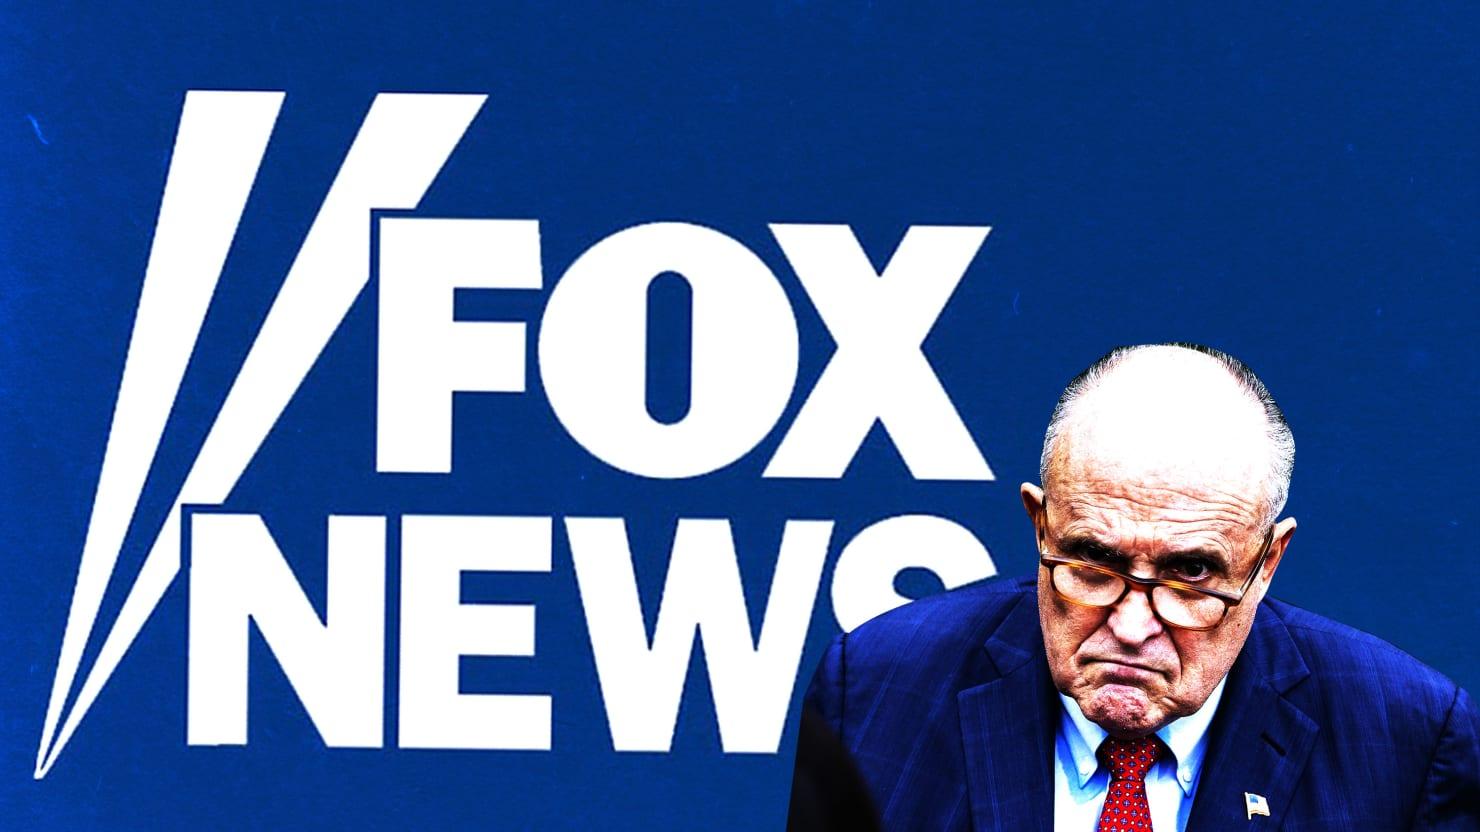 Fox News Keeps Rudy Giuliani on Air Despite Internal 'Disinformation' Docs